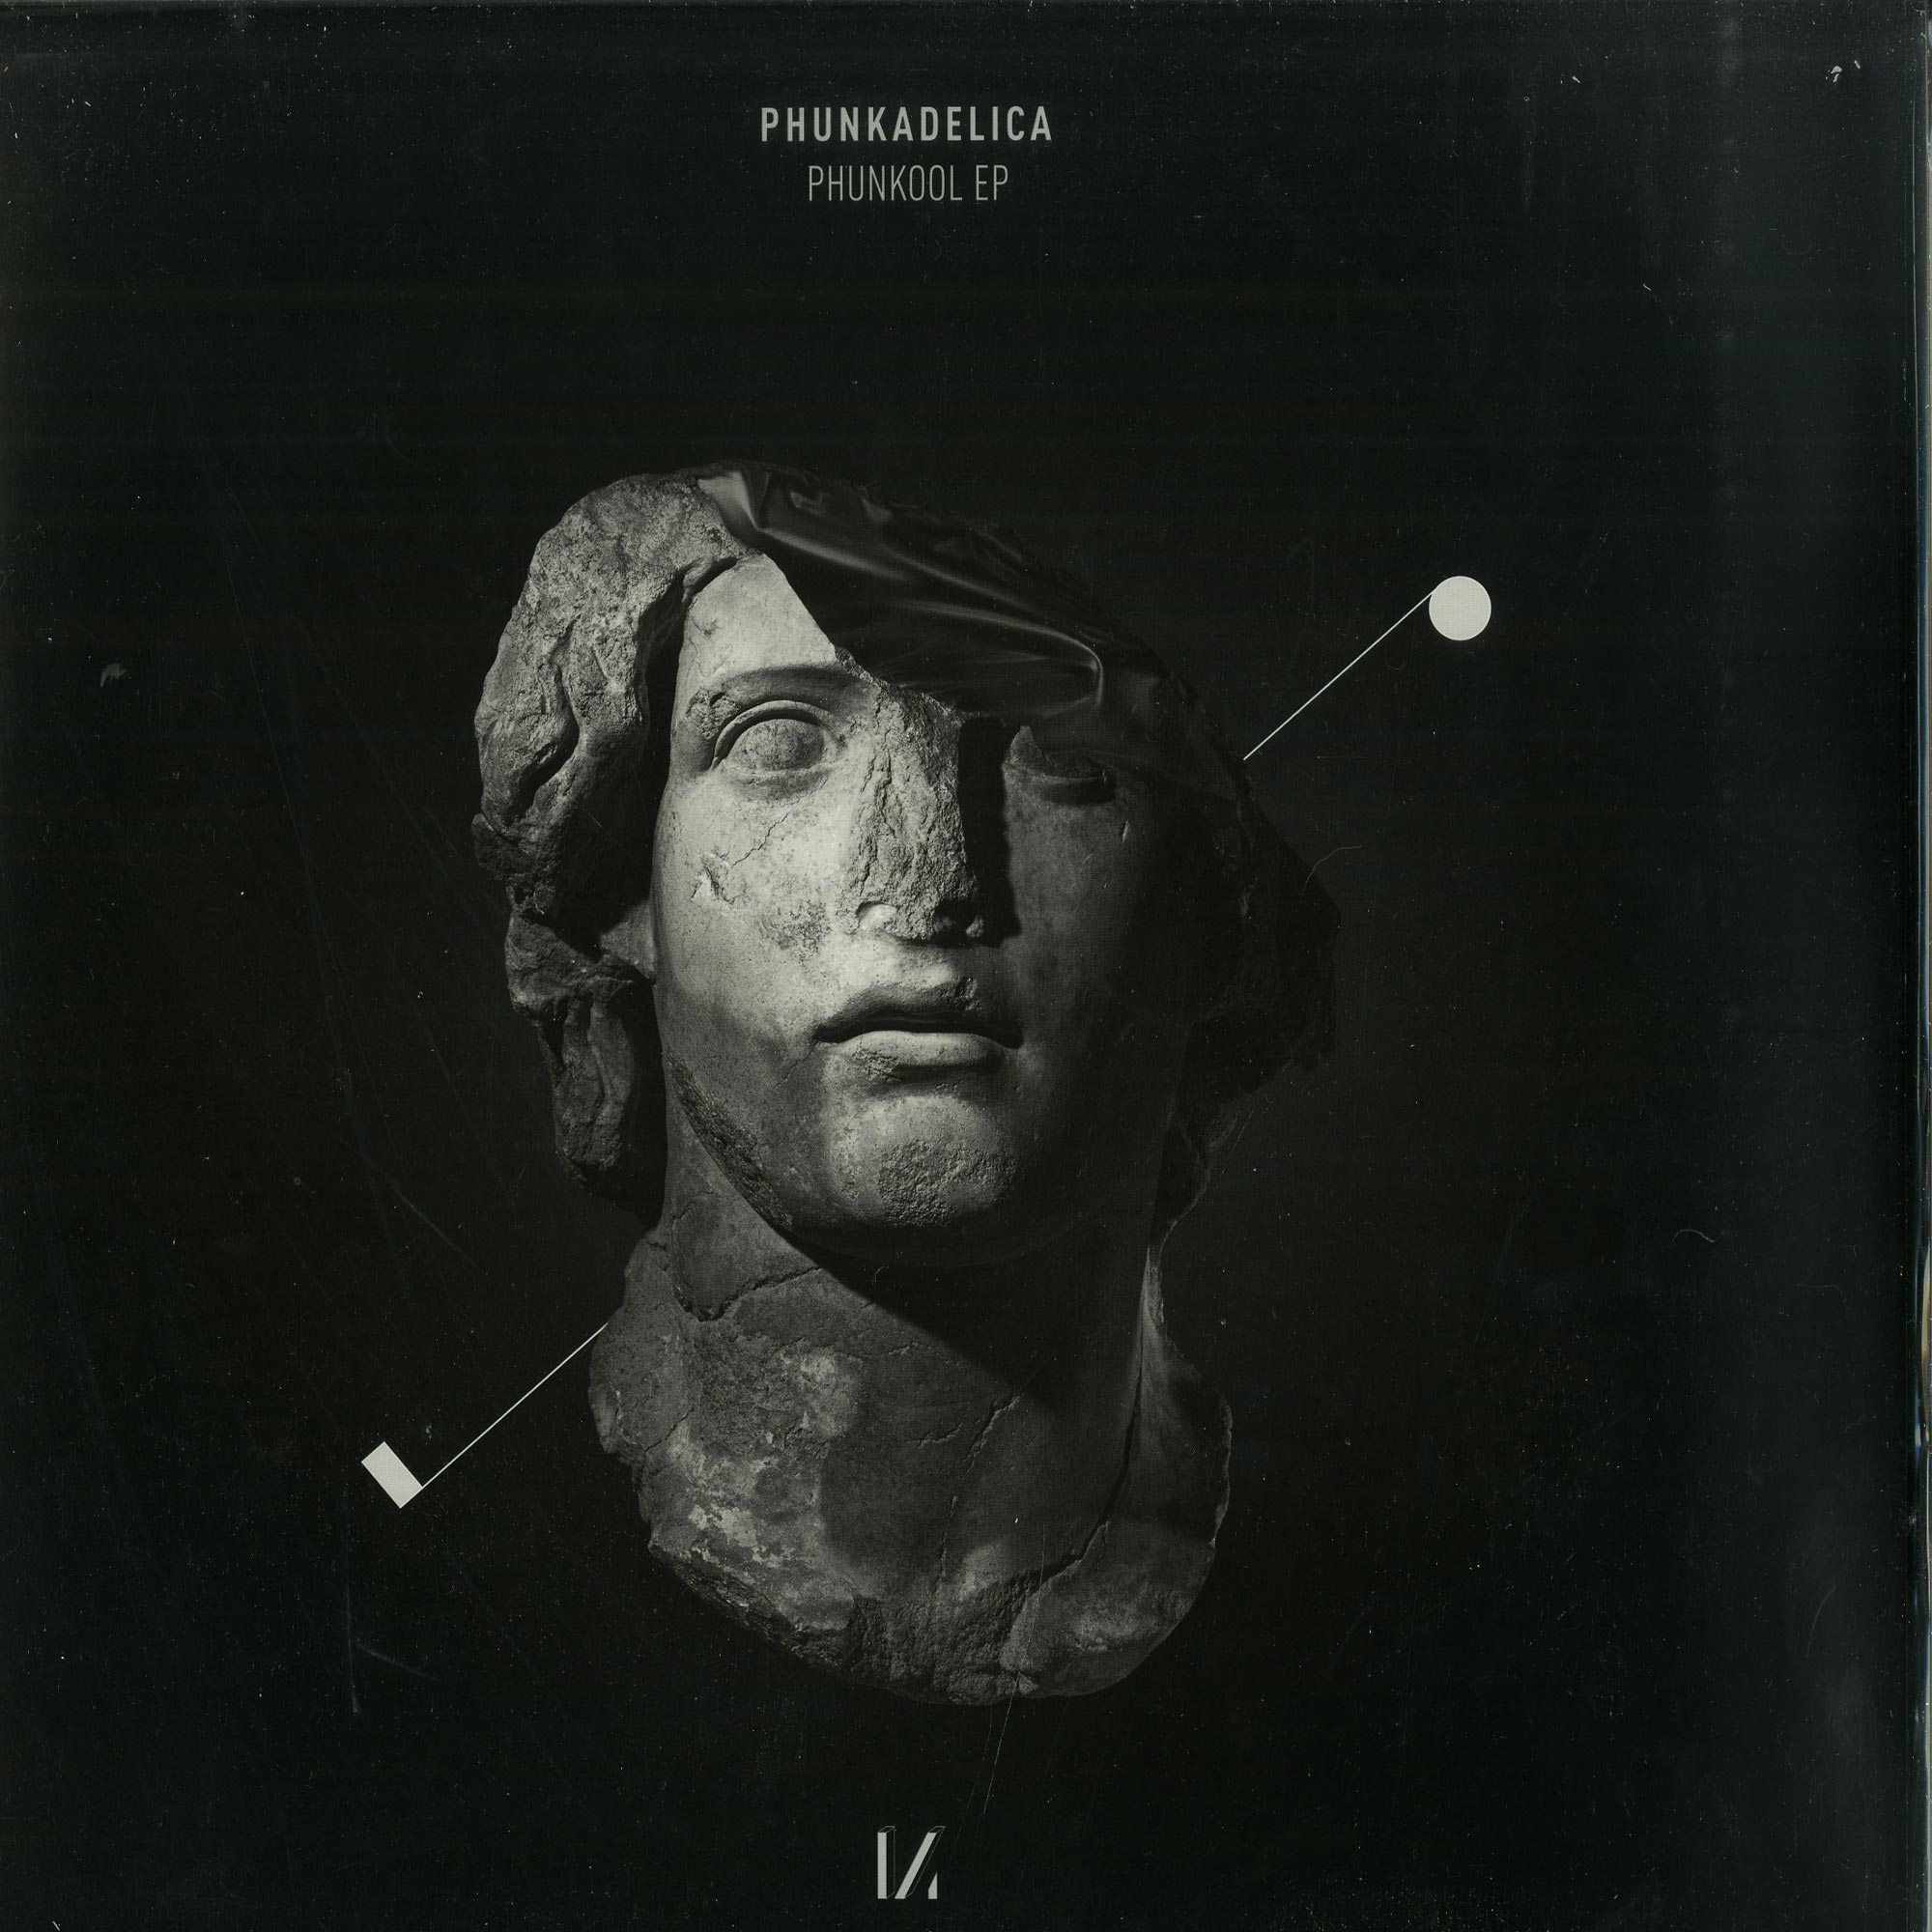 Phunkadelica - PHUNKOOL EP